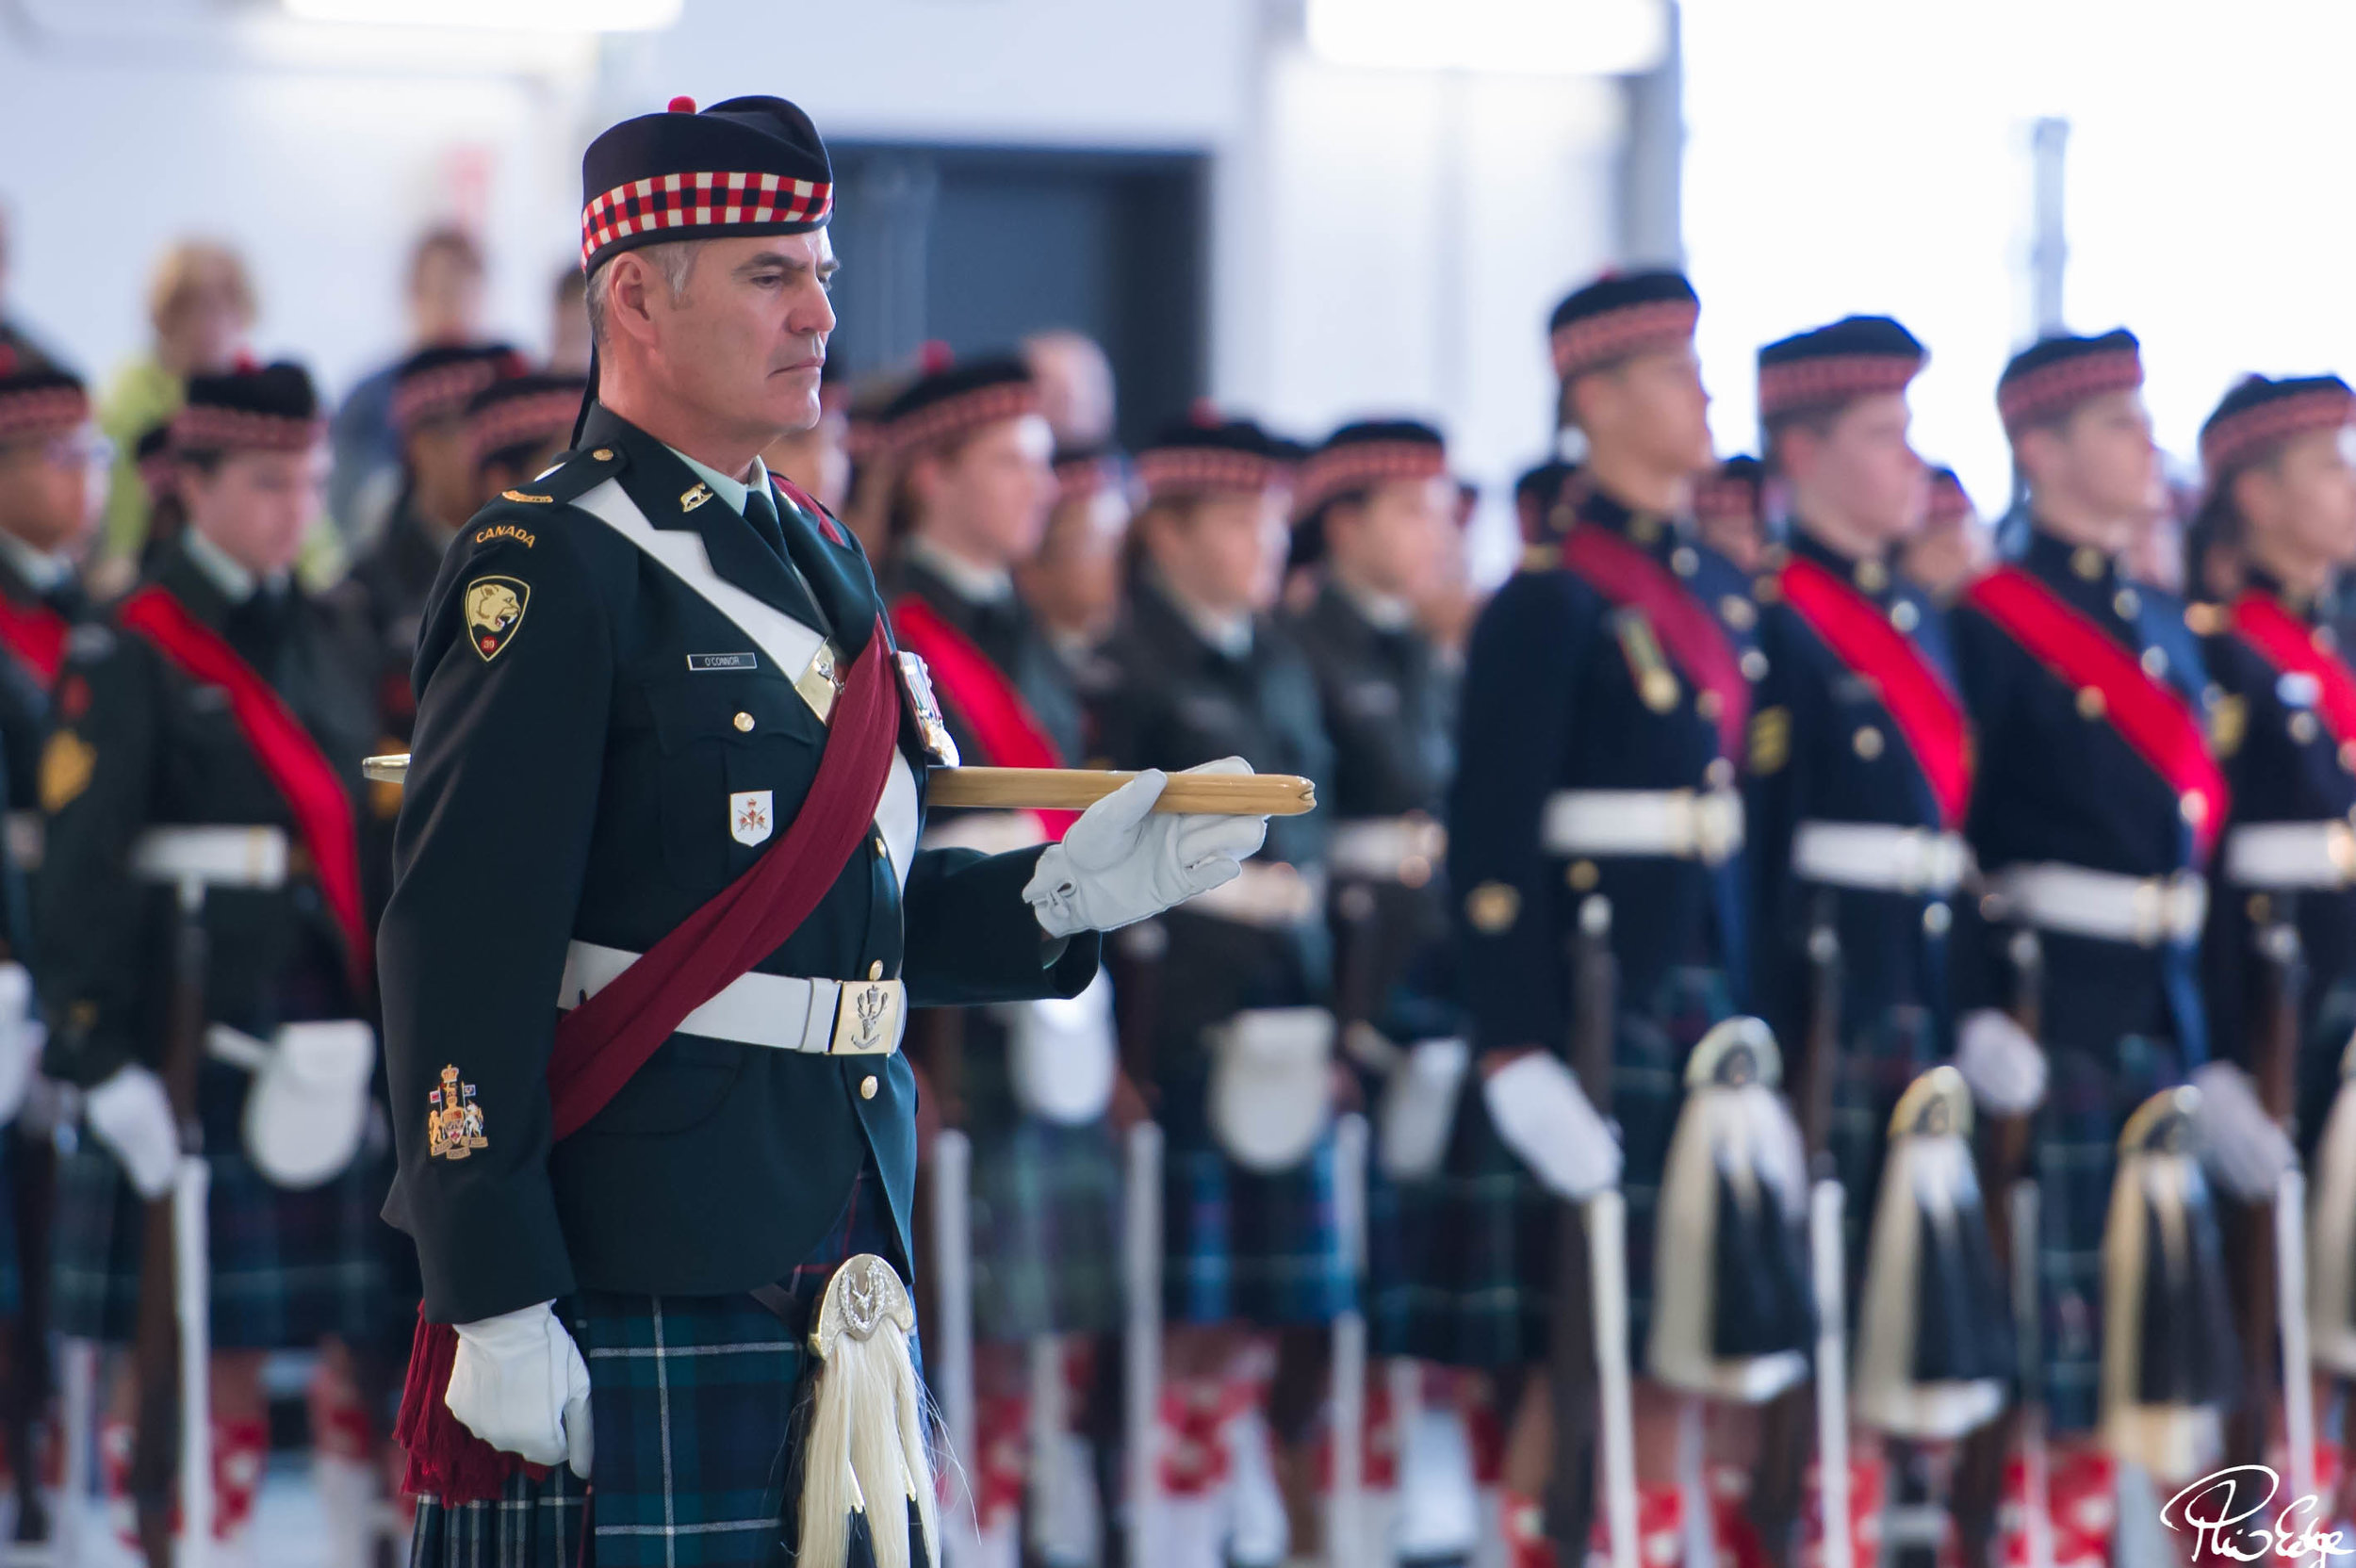 Seaforth Highlanders of Canada Homecoming 24 Sept 16 No-288.jpg